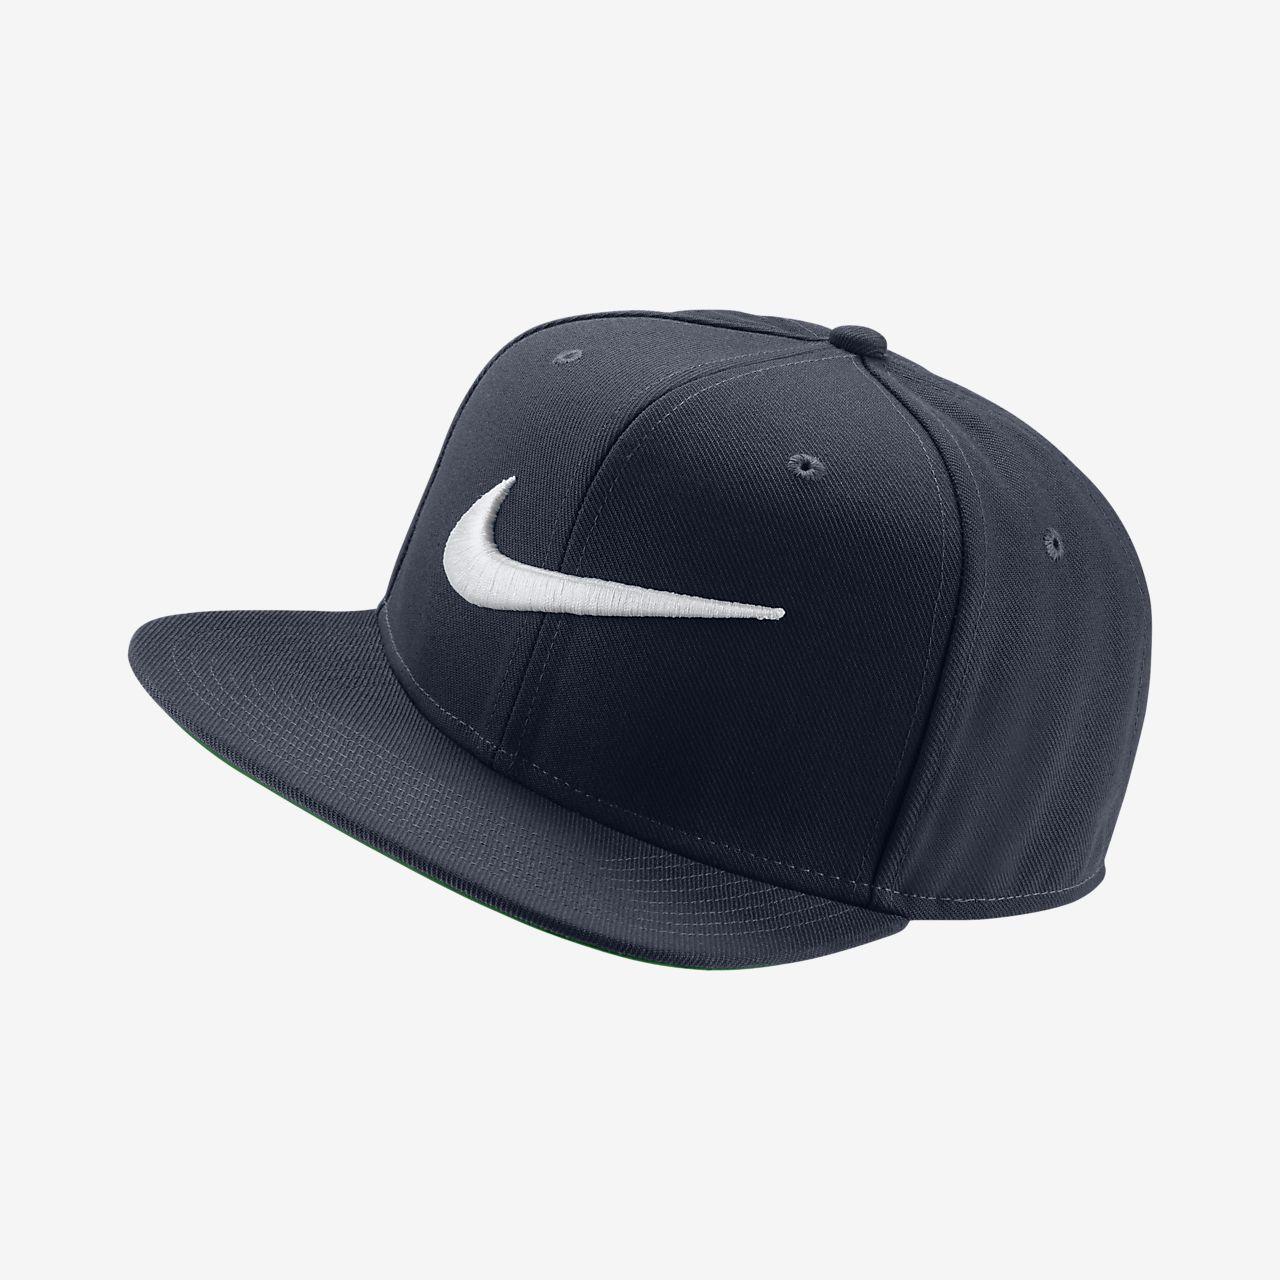 0cd1c2d4943be Nike Sportswear Pro Swoosh Gorra regulable. Nike.com ES